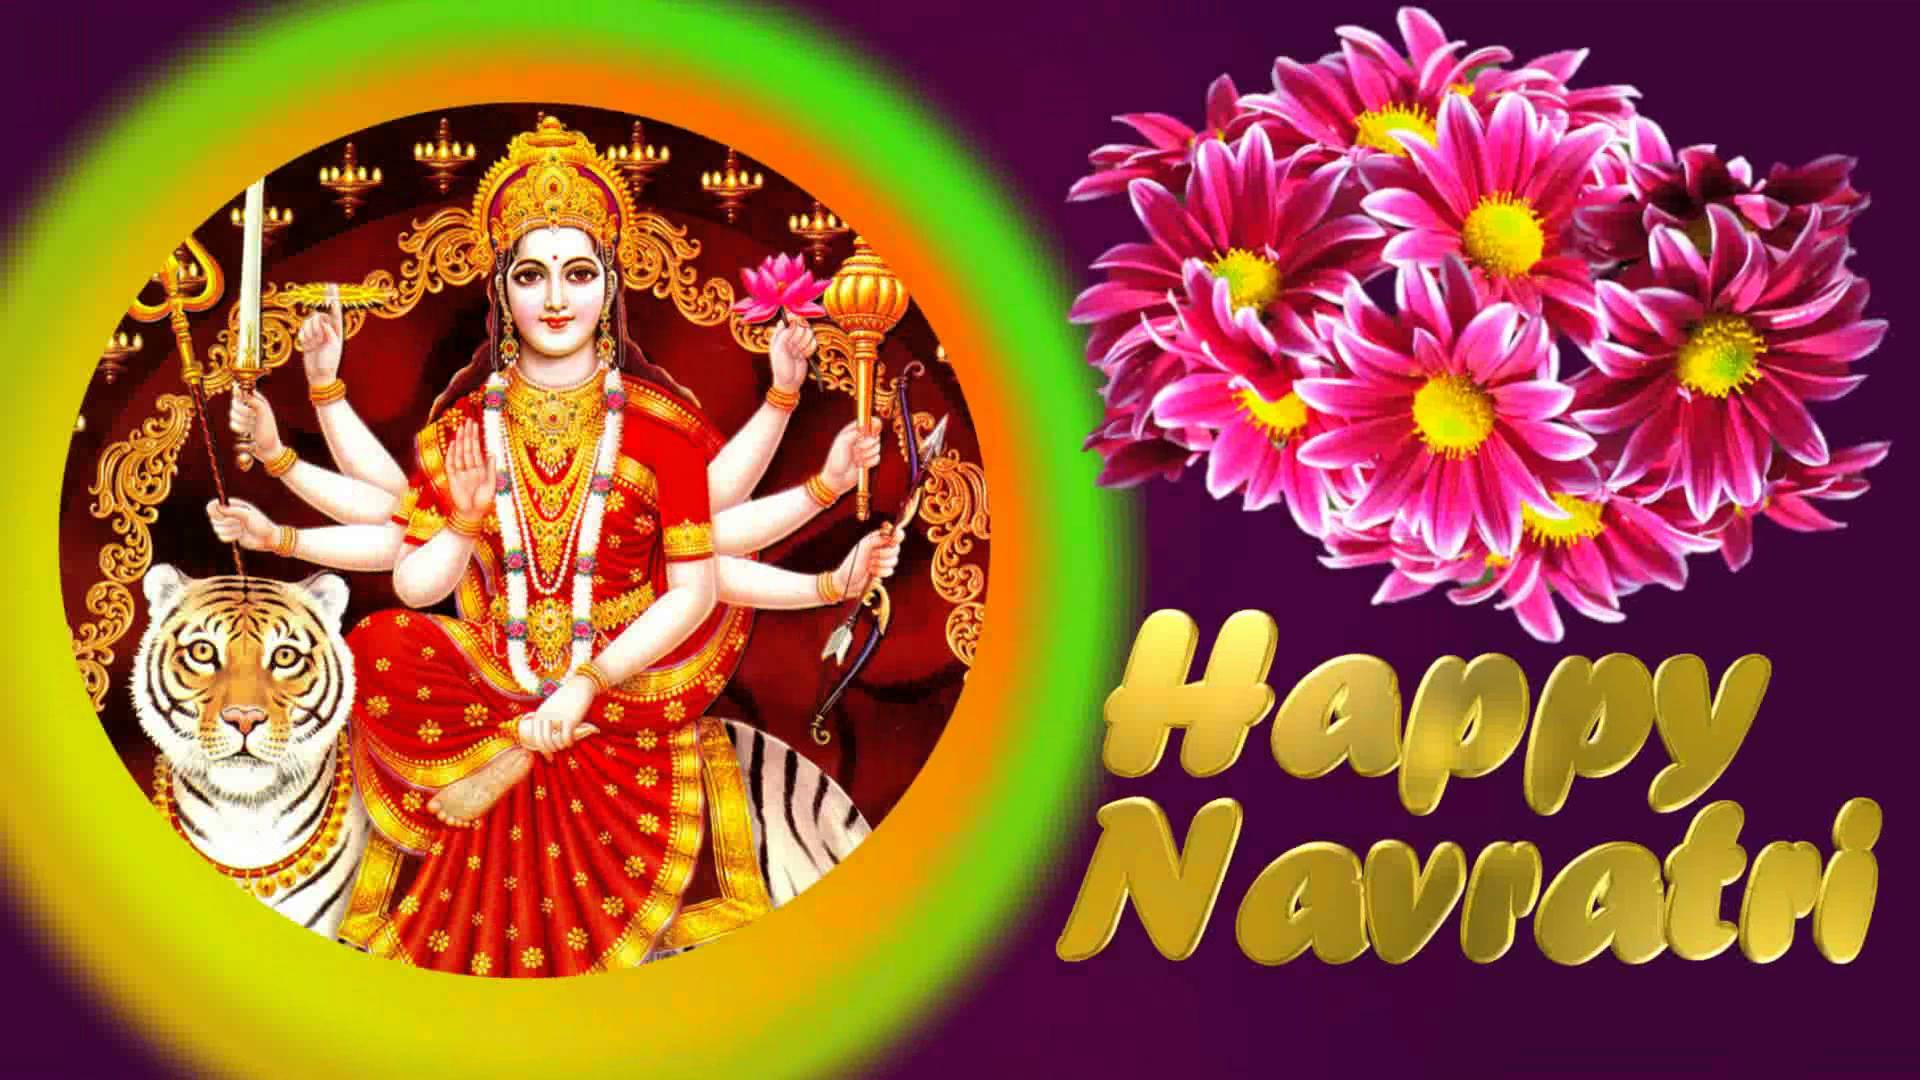 Navratri 2018 Puja Vidhi, Puja Timings, Tithi and Vrat Katha